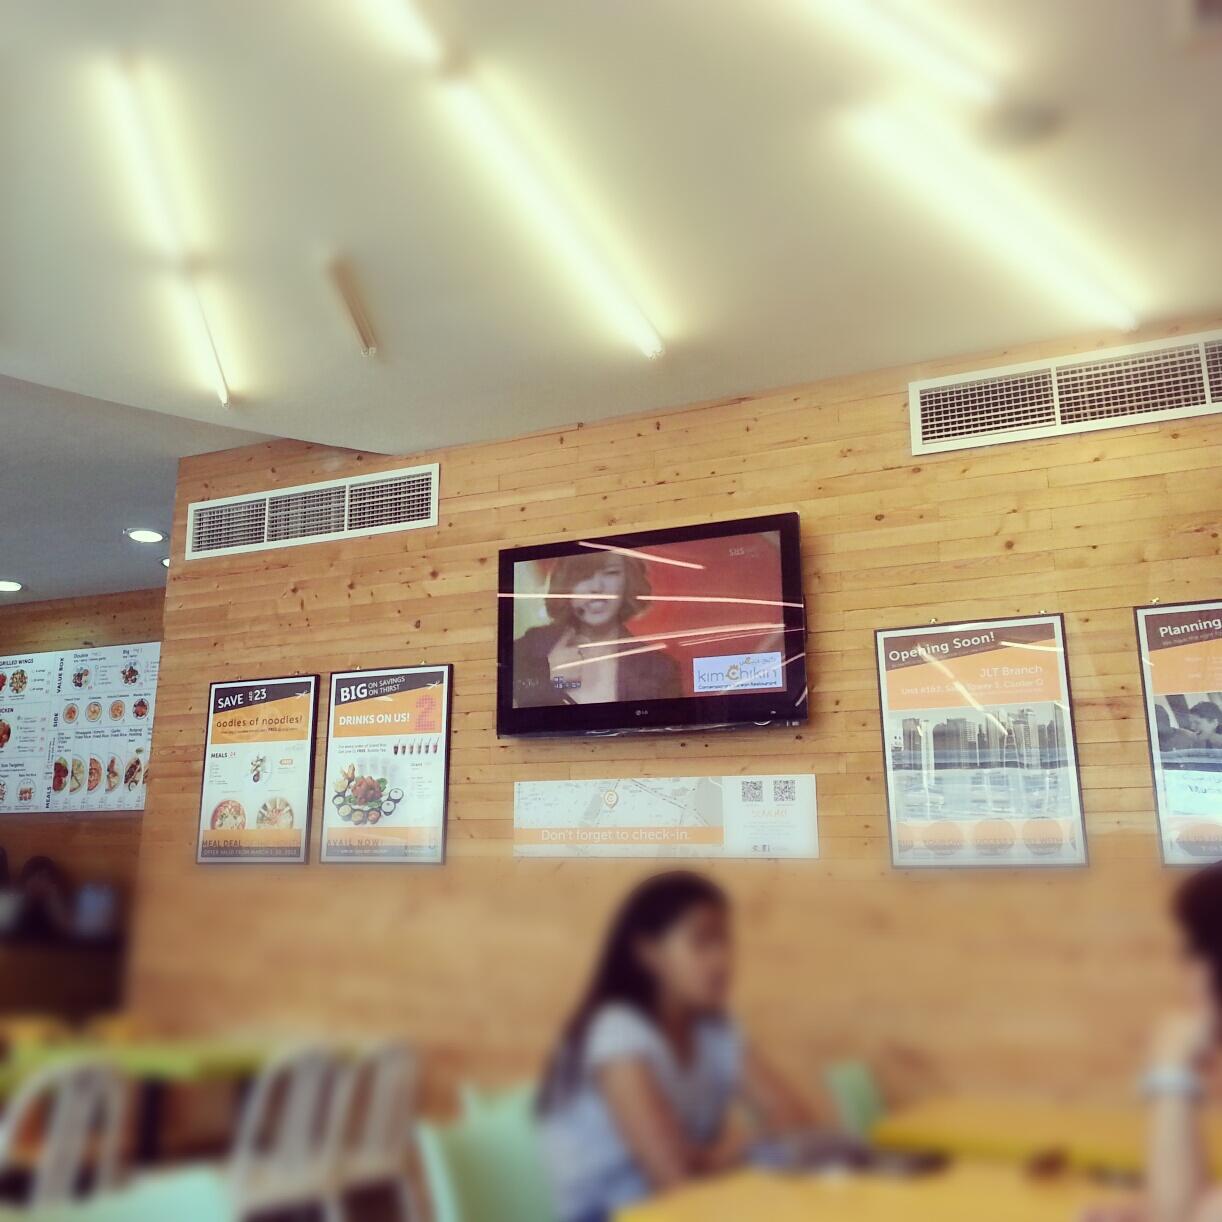 Korean Fast Food Chain Philippines